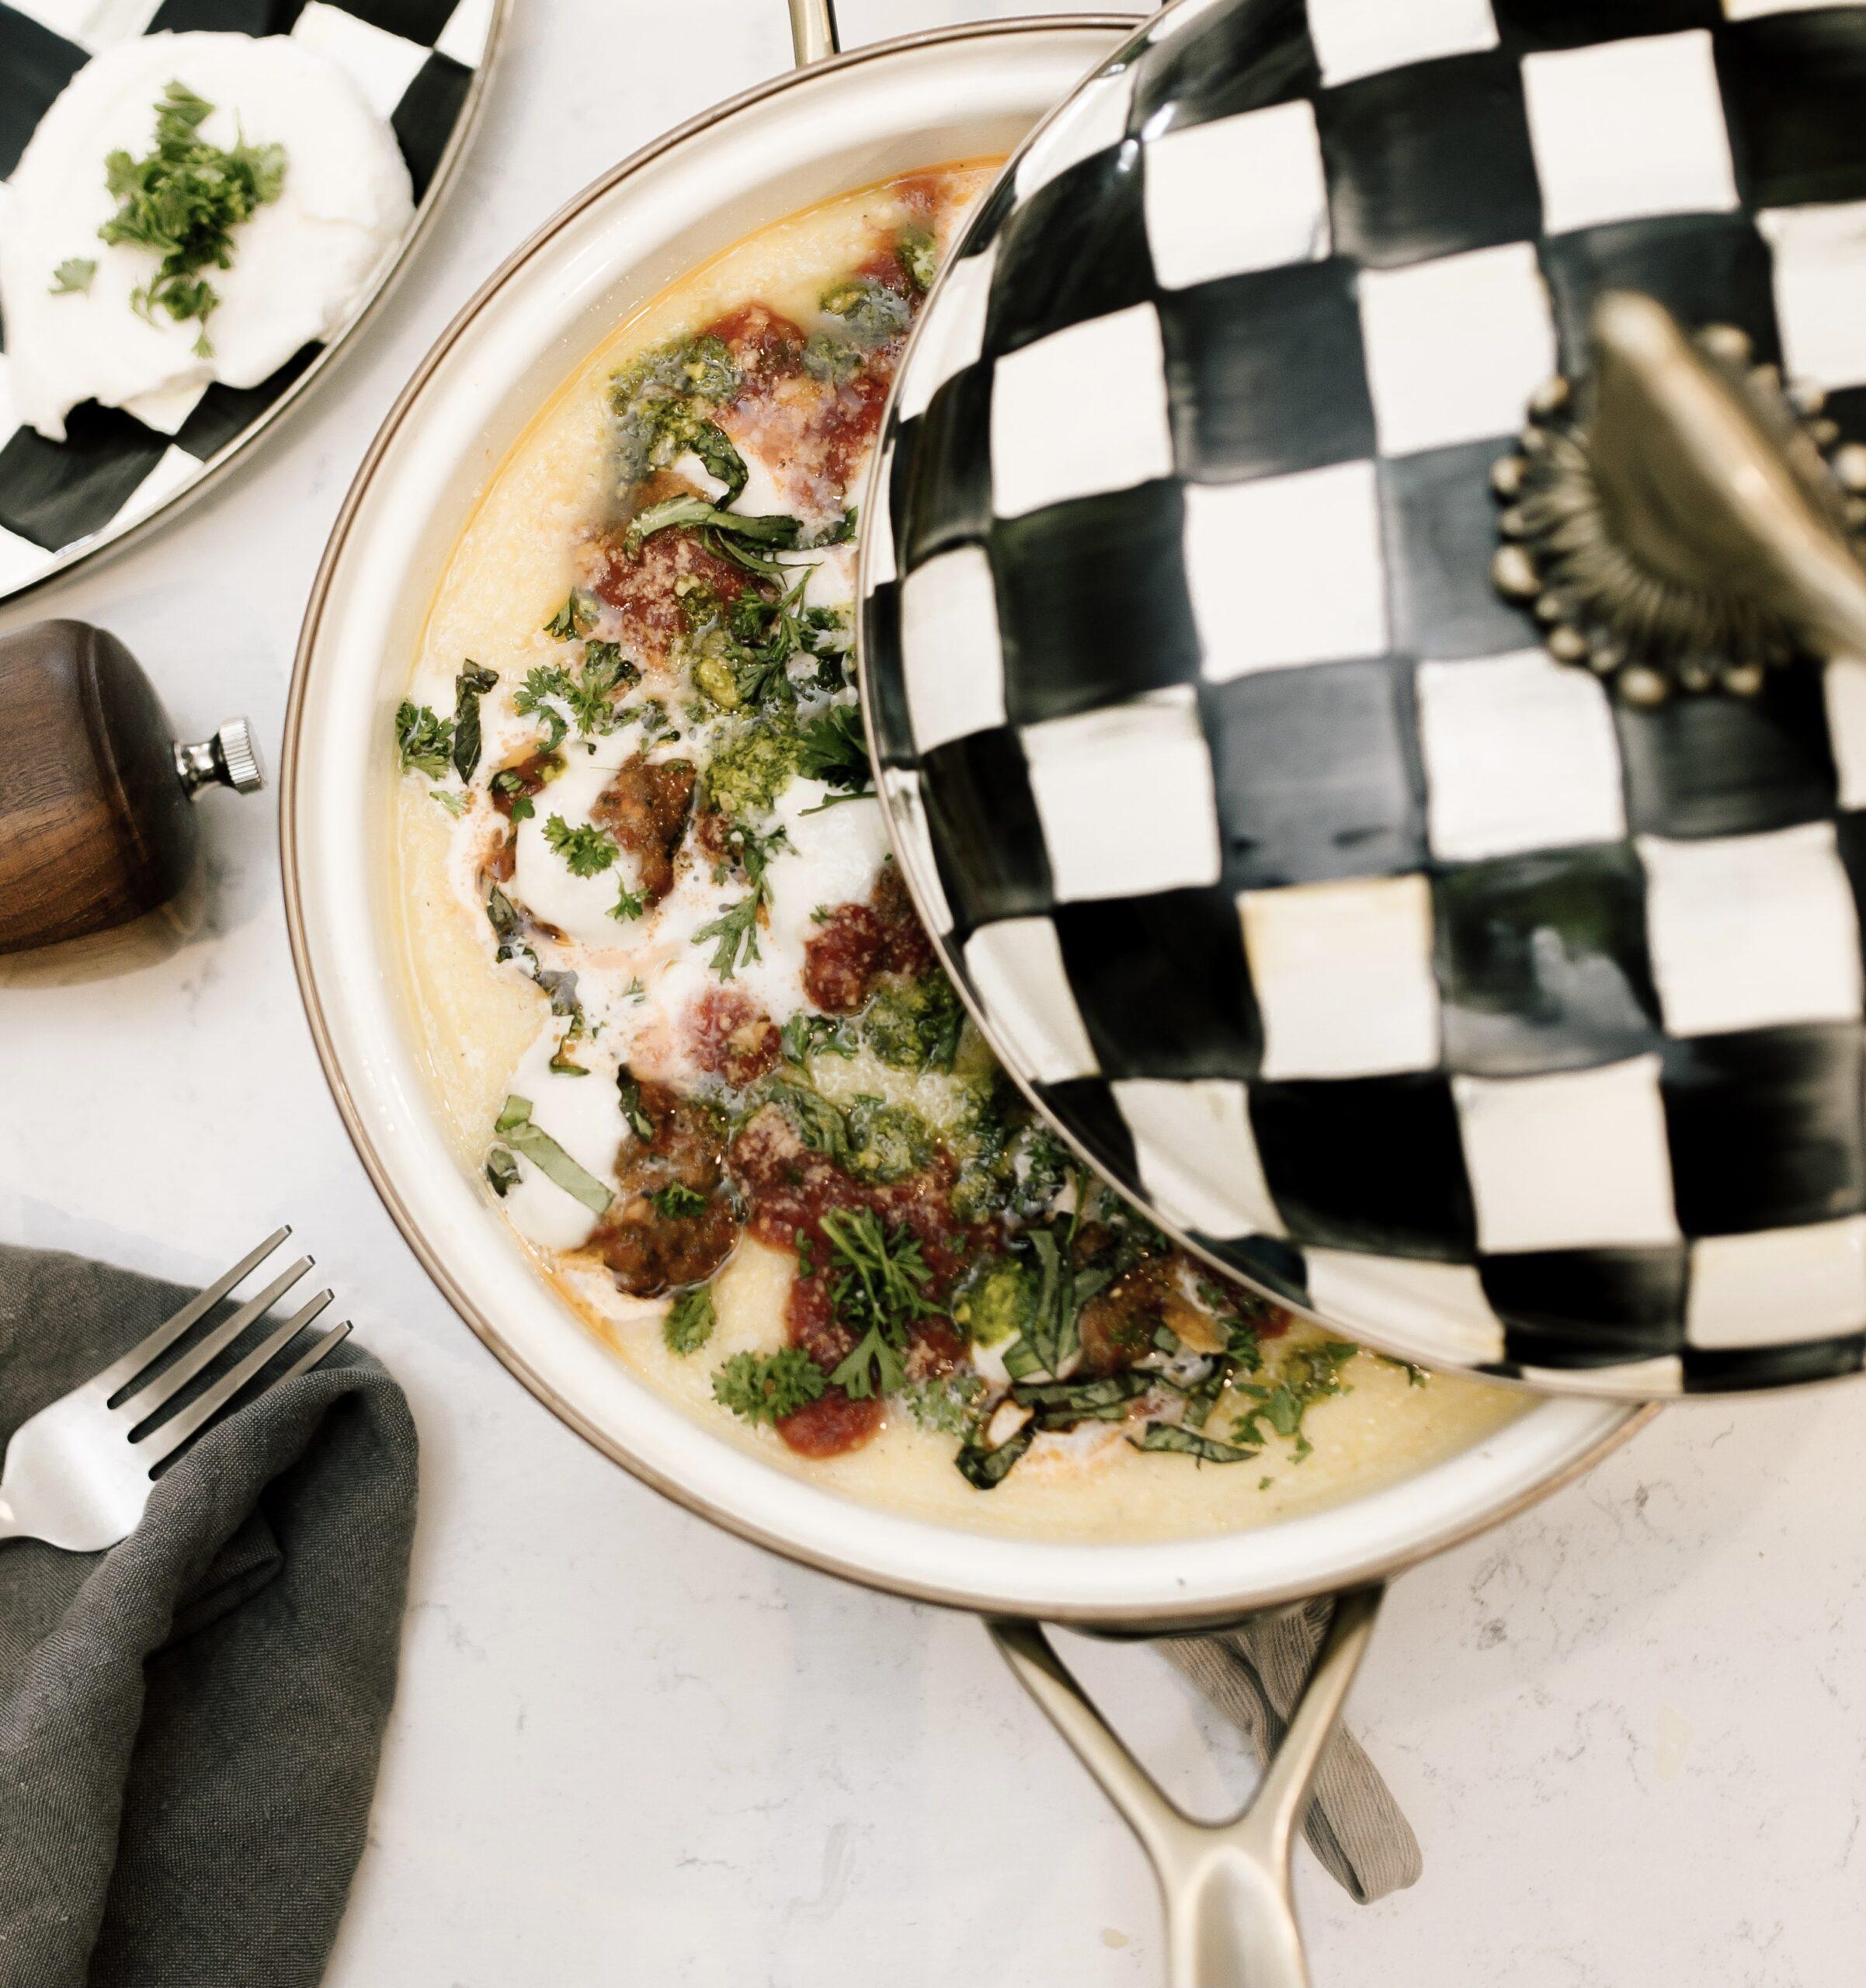 creamy polenta with meatballs